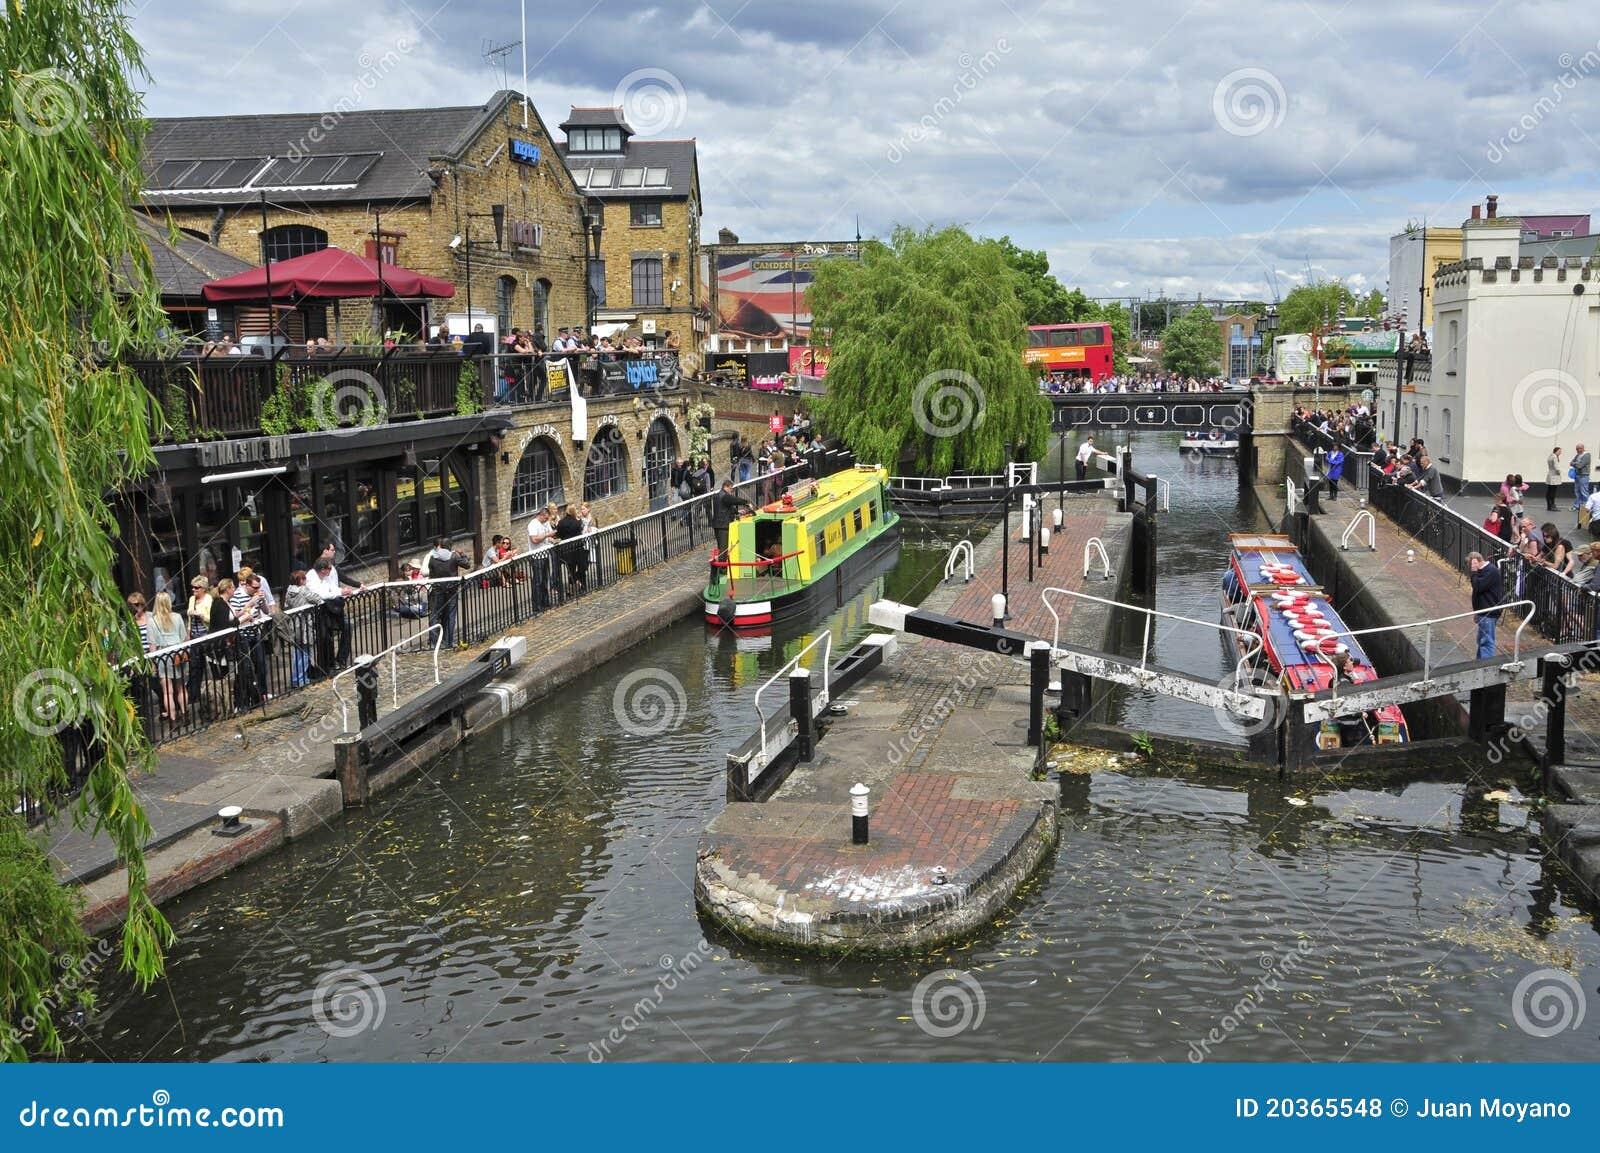 Camden Lock in London, United Kingdom